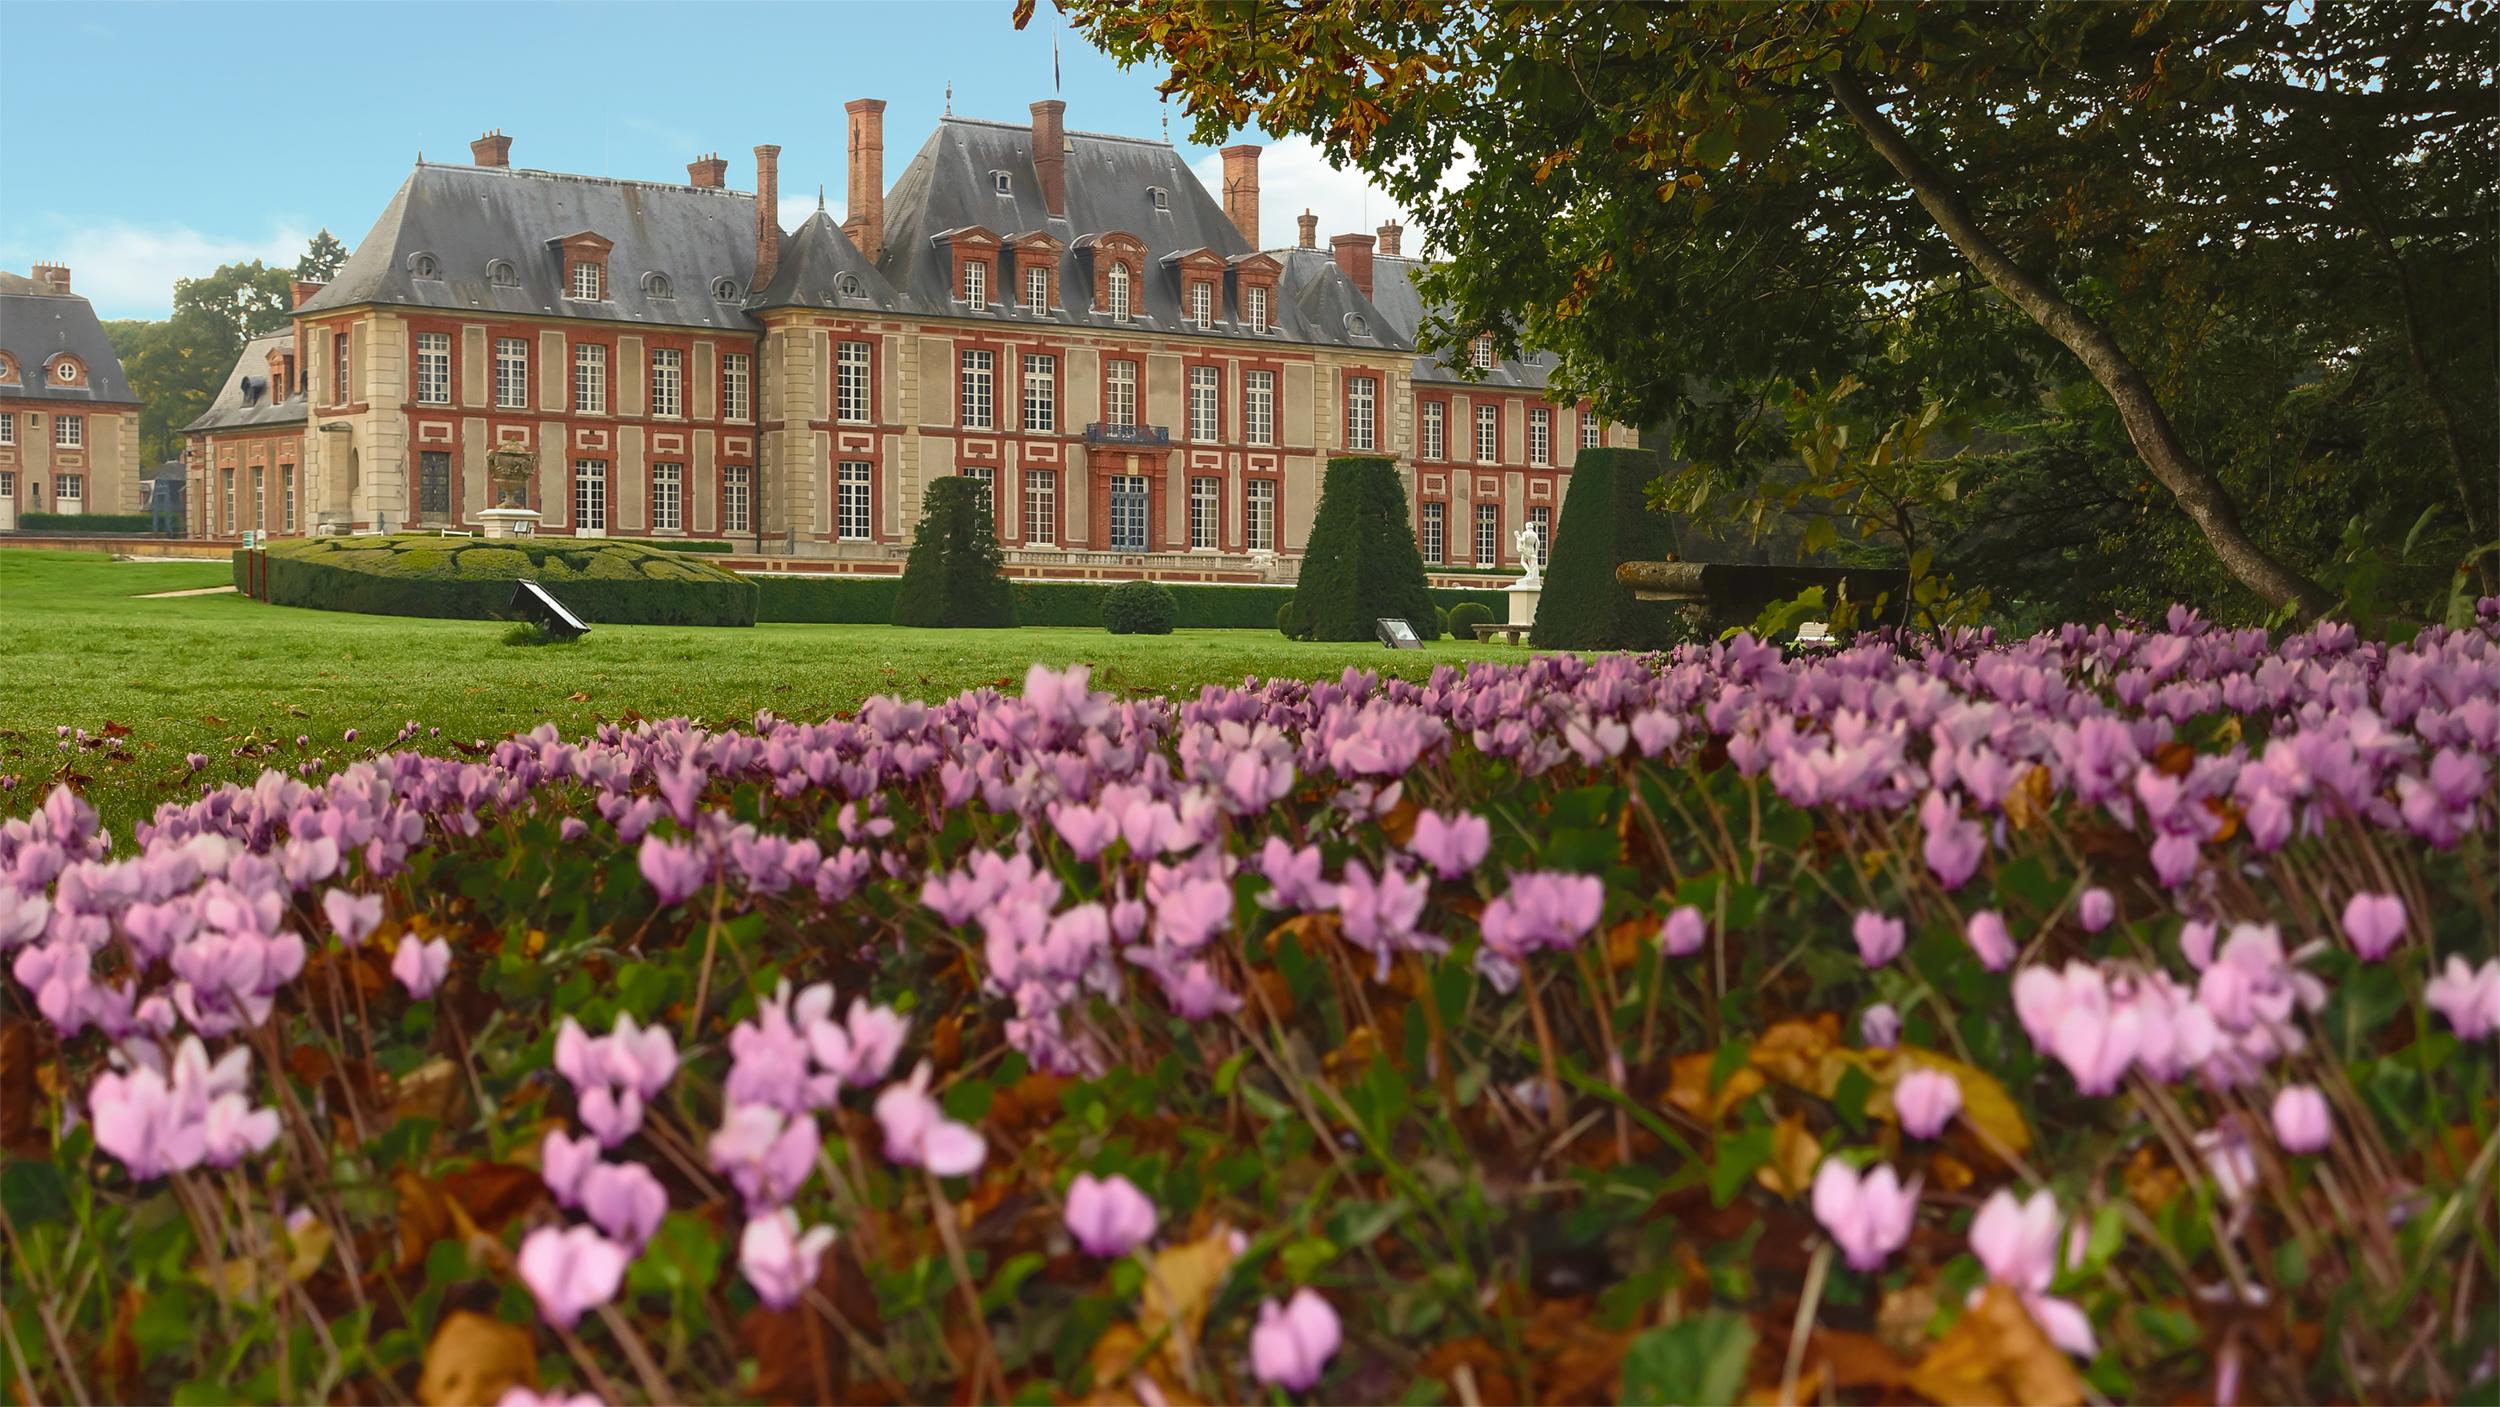 French garden, french formal garden